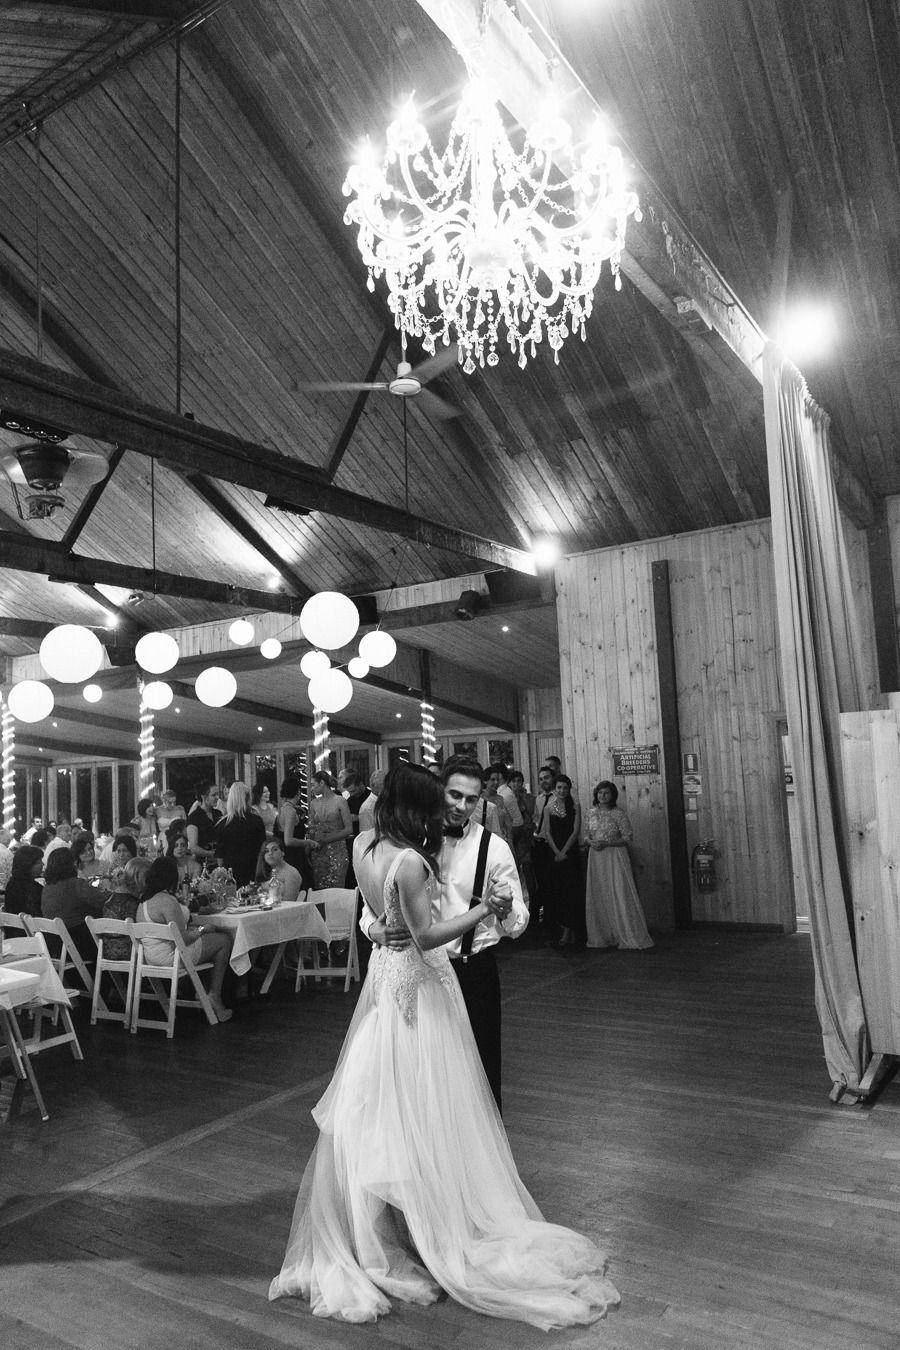 Photography: Nicole Cordeiro - nicolecordeiro.com.au/  Read More: http://www.stylemepretty.com/australia-weddings/south-australia-au/adelaide/2013/10/23/adelaide-hills-wedding-from-nicole-cordeiro-photography/